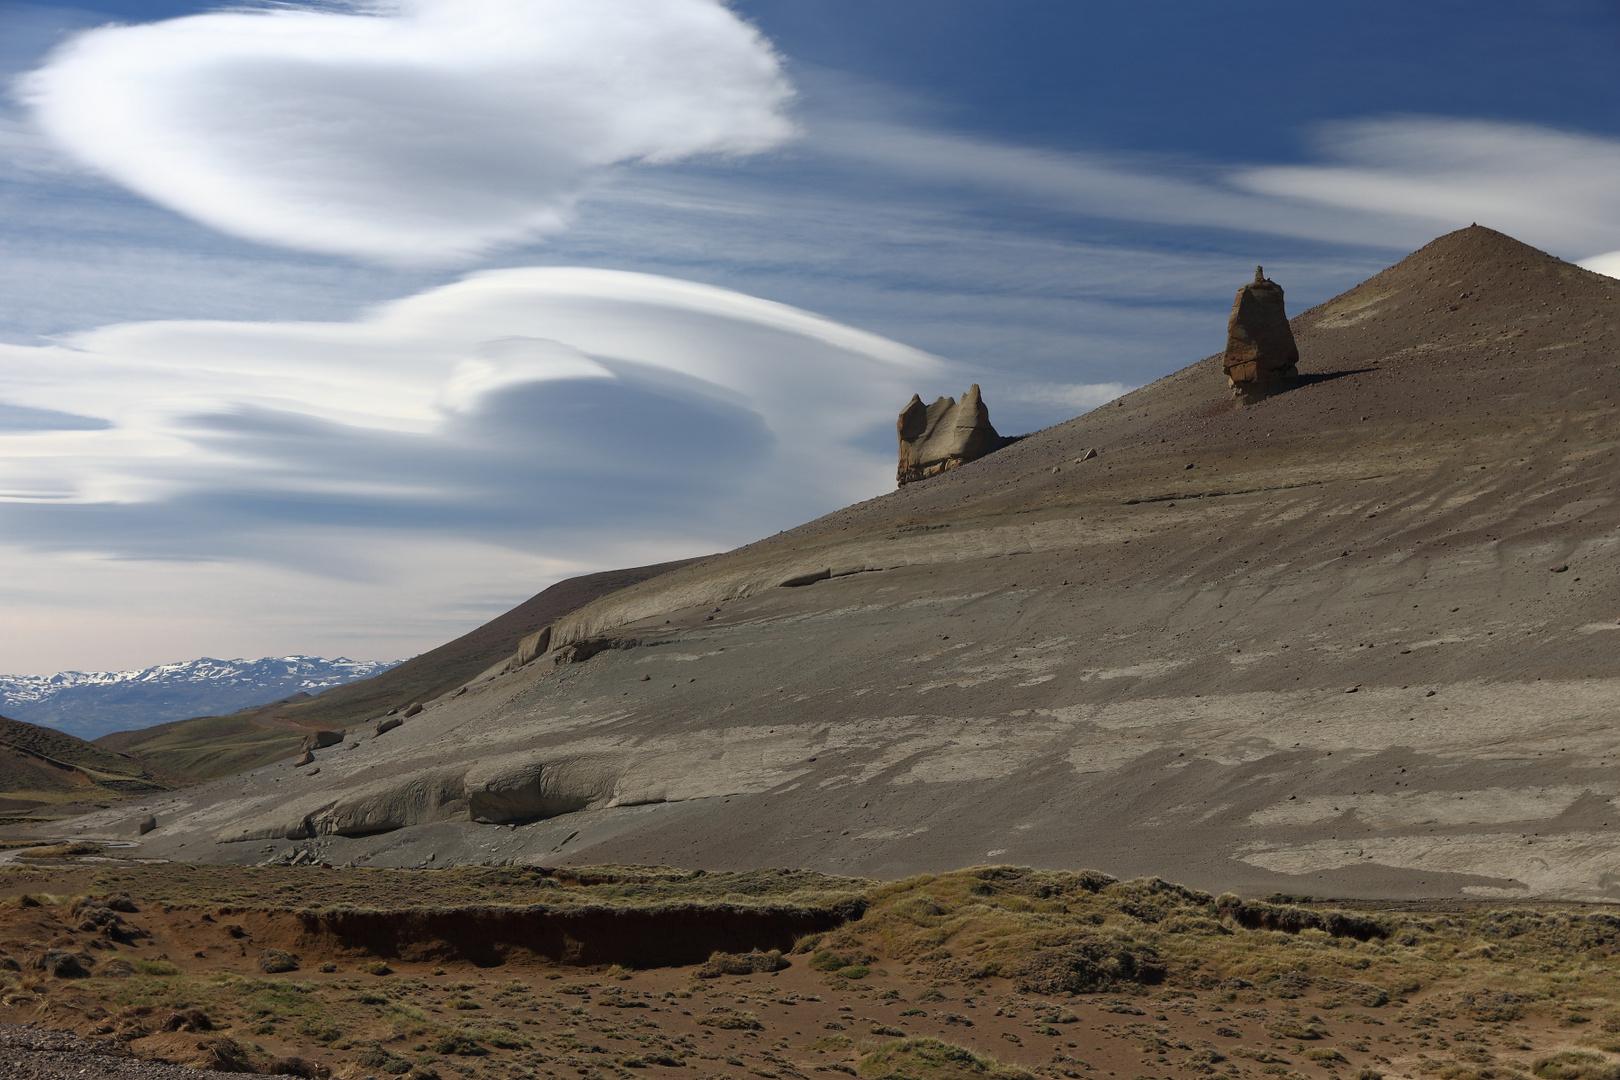 amazing landscape on Ruta 41 - Patagonia - Argentina